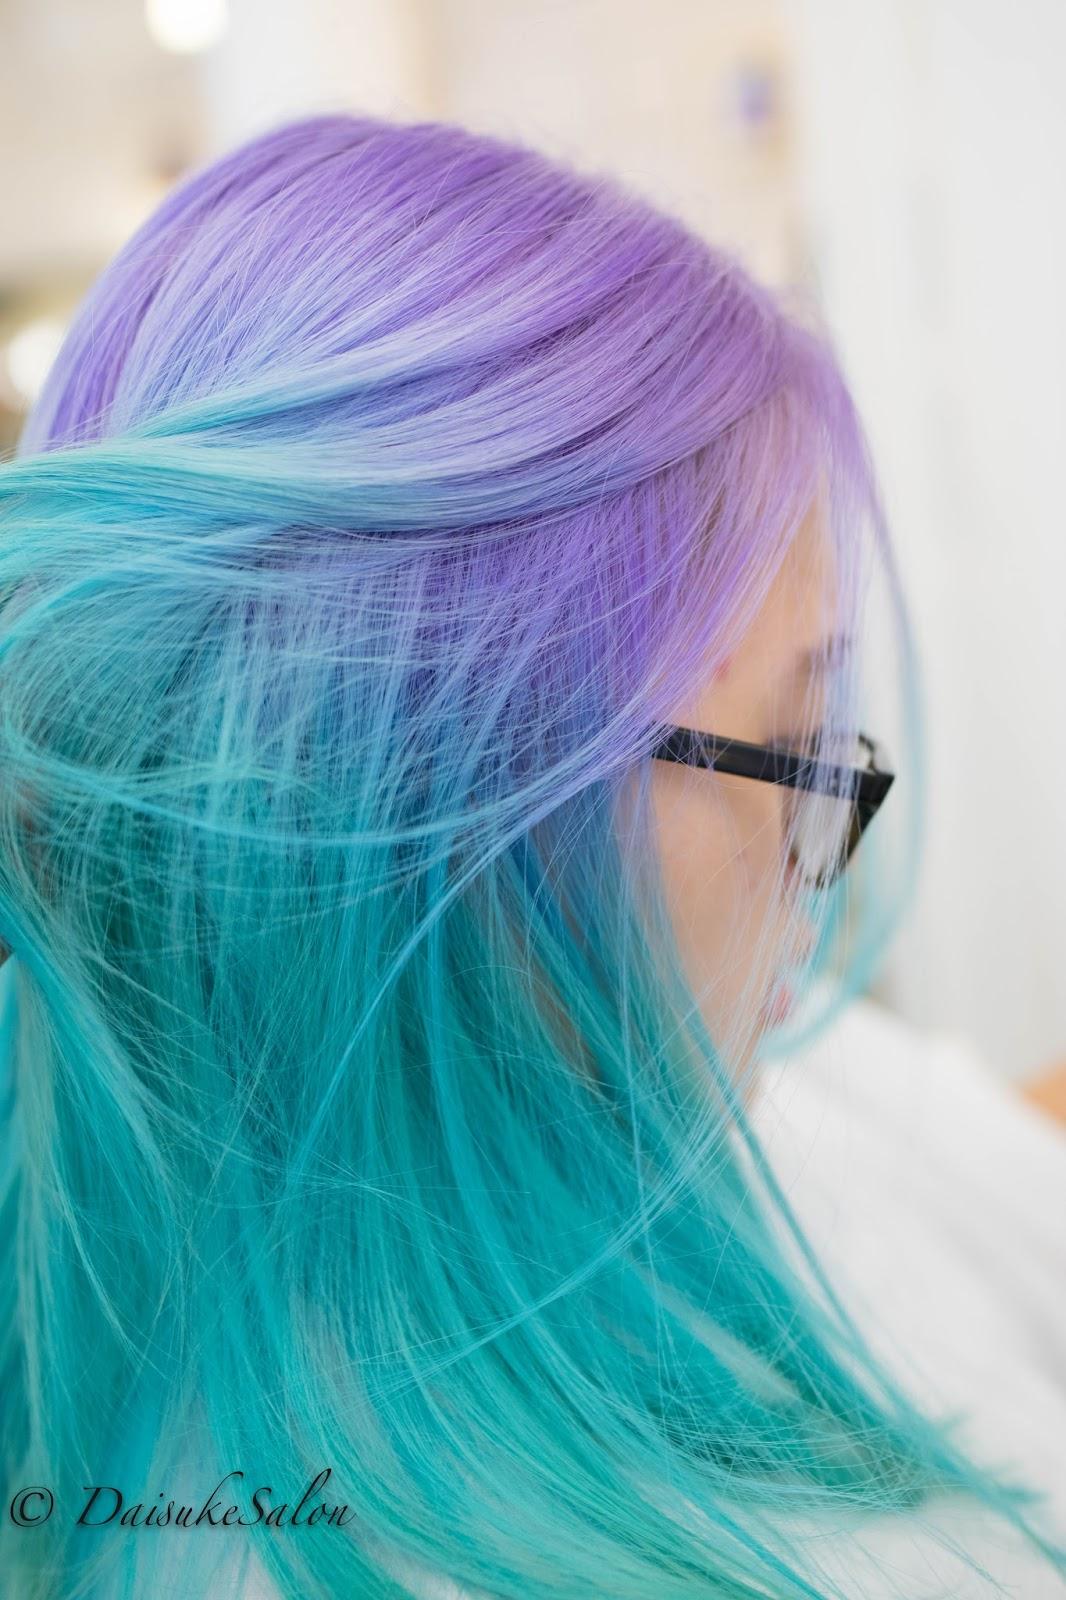 Breathtaking Mermaid Hair Color Unicorn Rainbow By Linh Phan The Braid Is Gorgeous